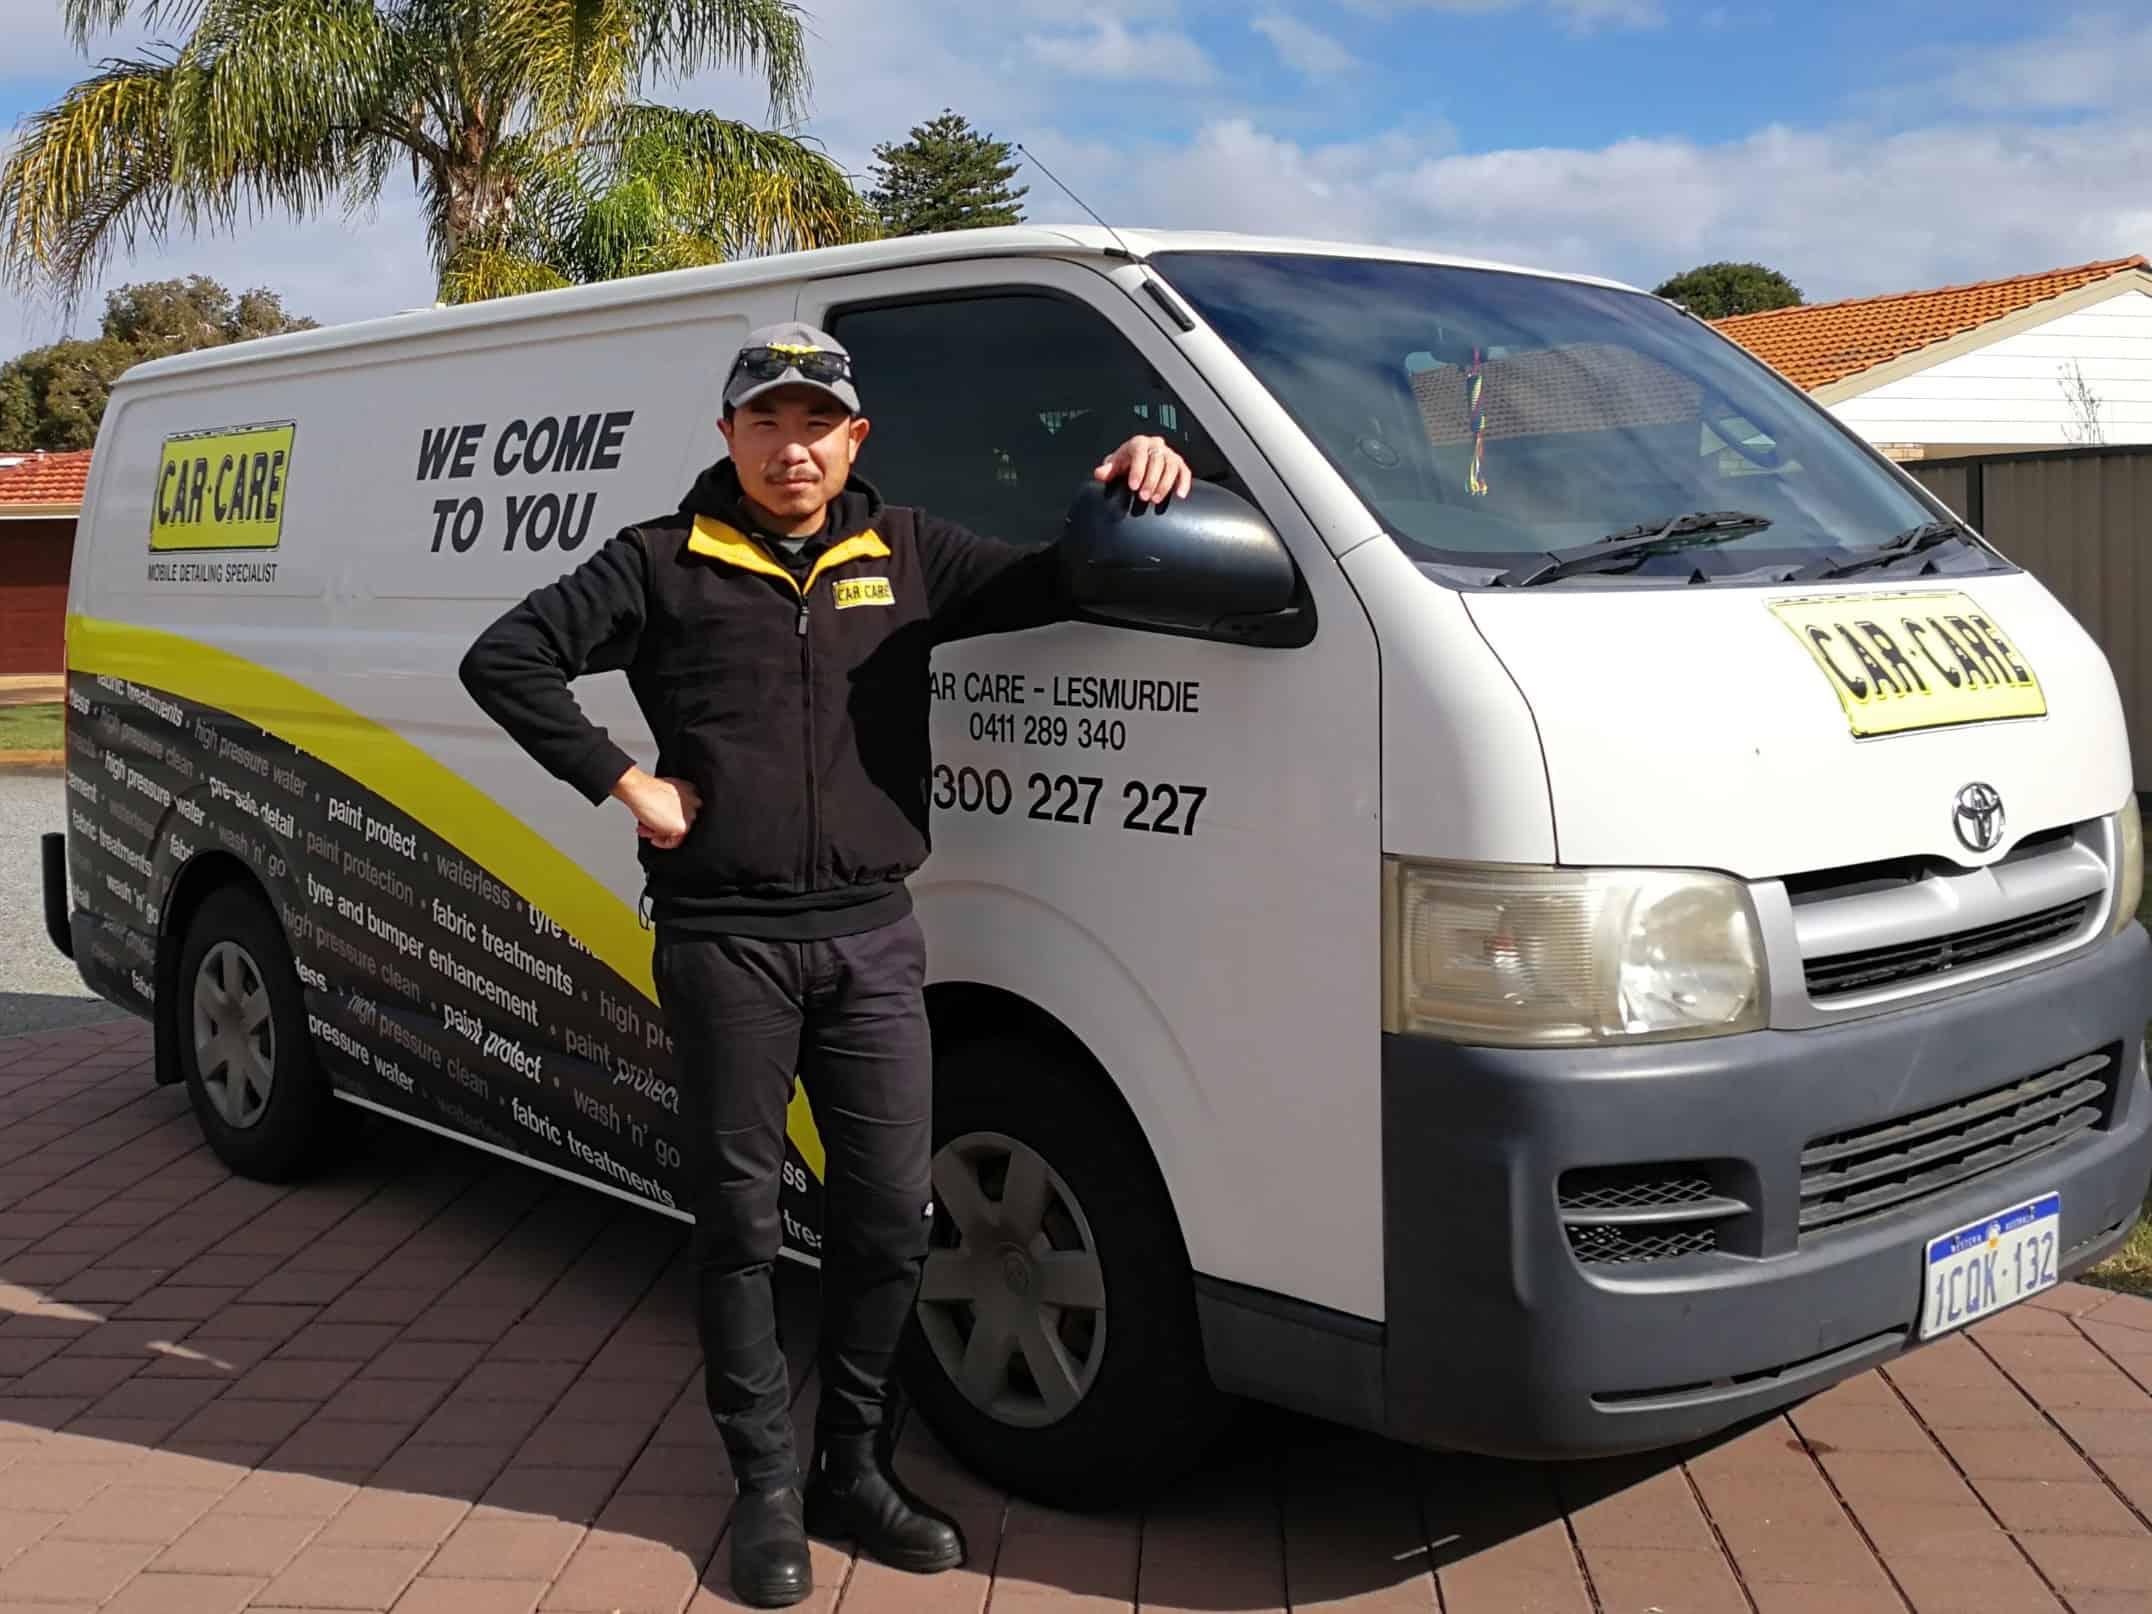 ANDY CAR CARE LESMURDIE by white Car Care van